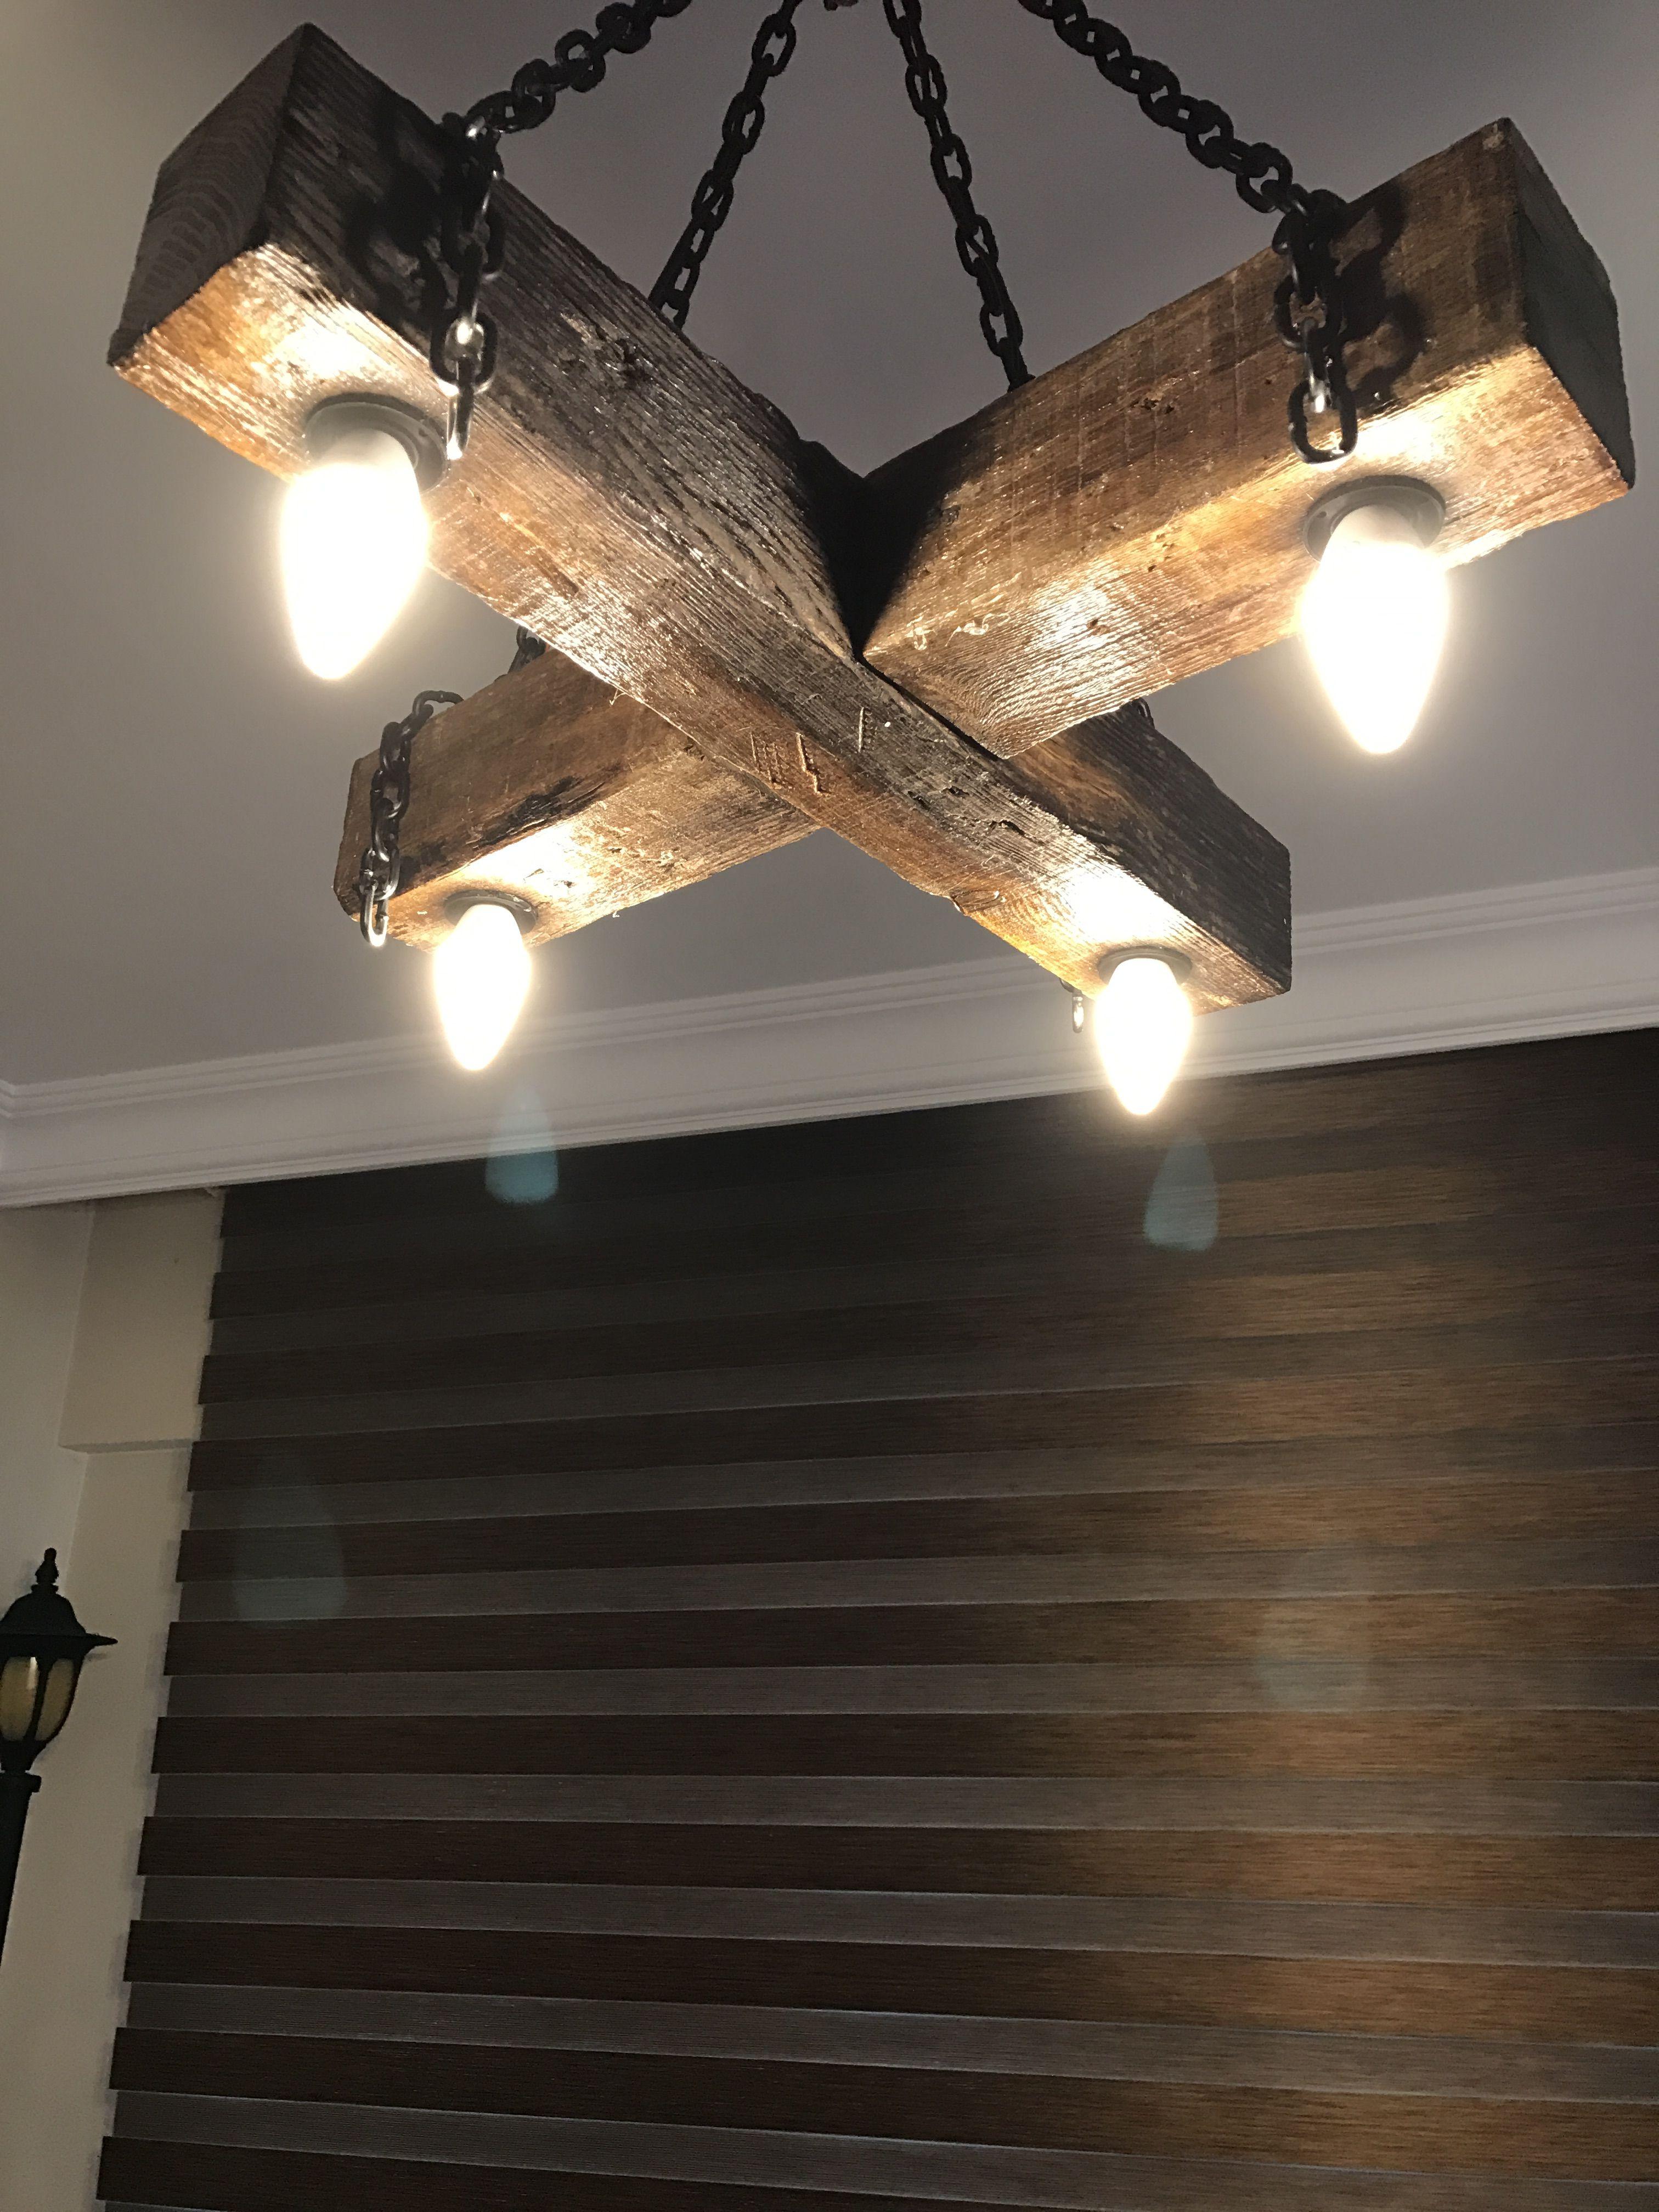 Ahap Avize House Pinterest Lighting Rustic And Vintage 193039s Ge Table Fan Needs Rewiring Fans Etsy Lustre Garage Kitchen Home Design Driftwood